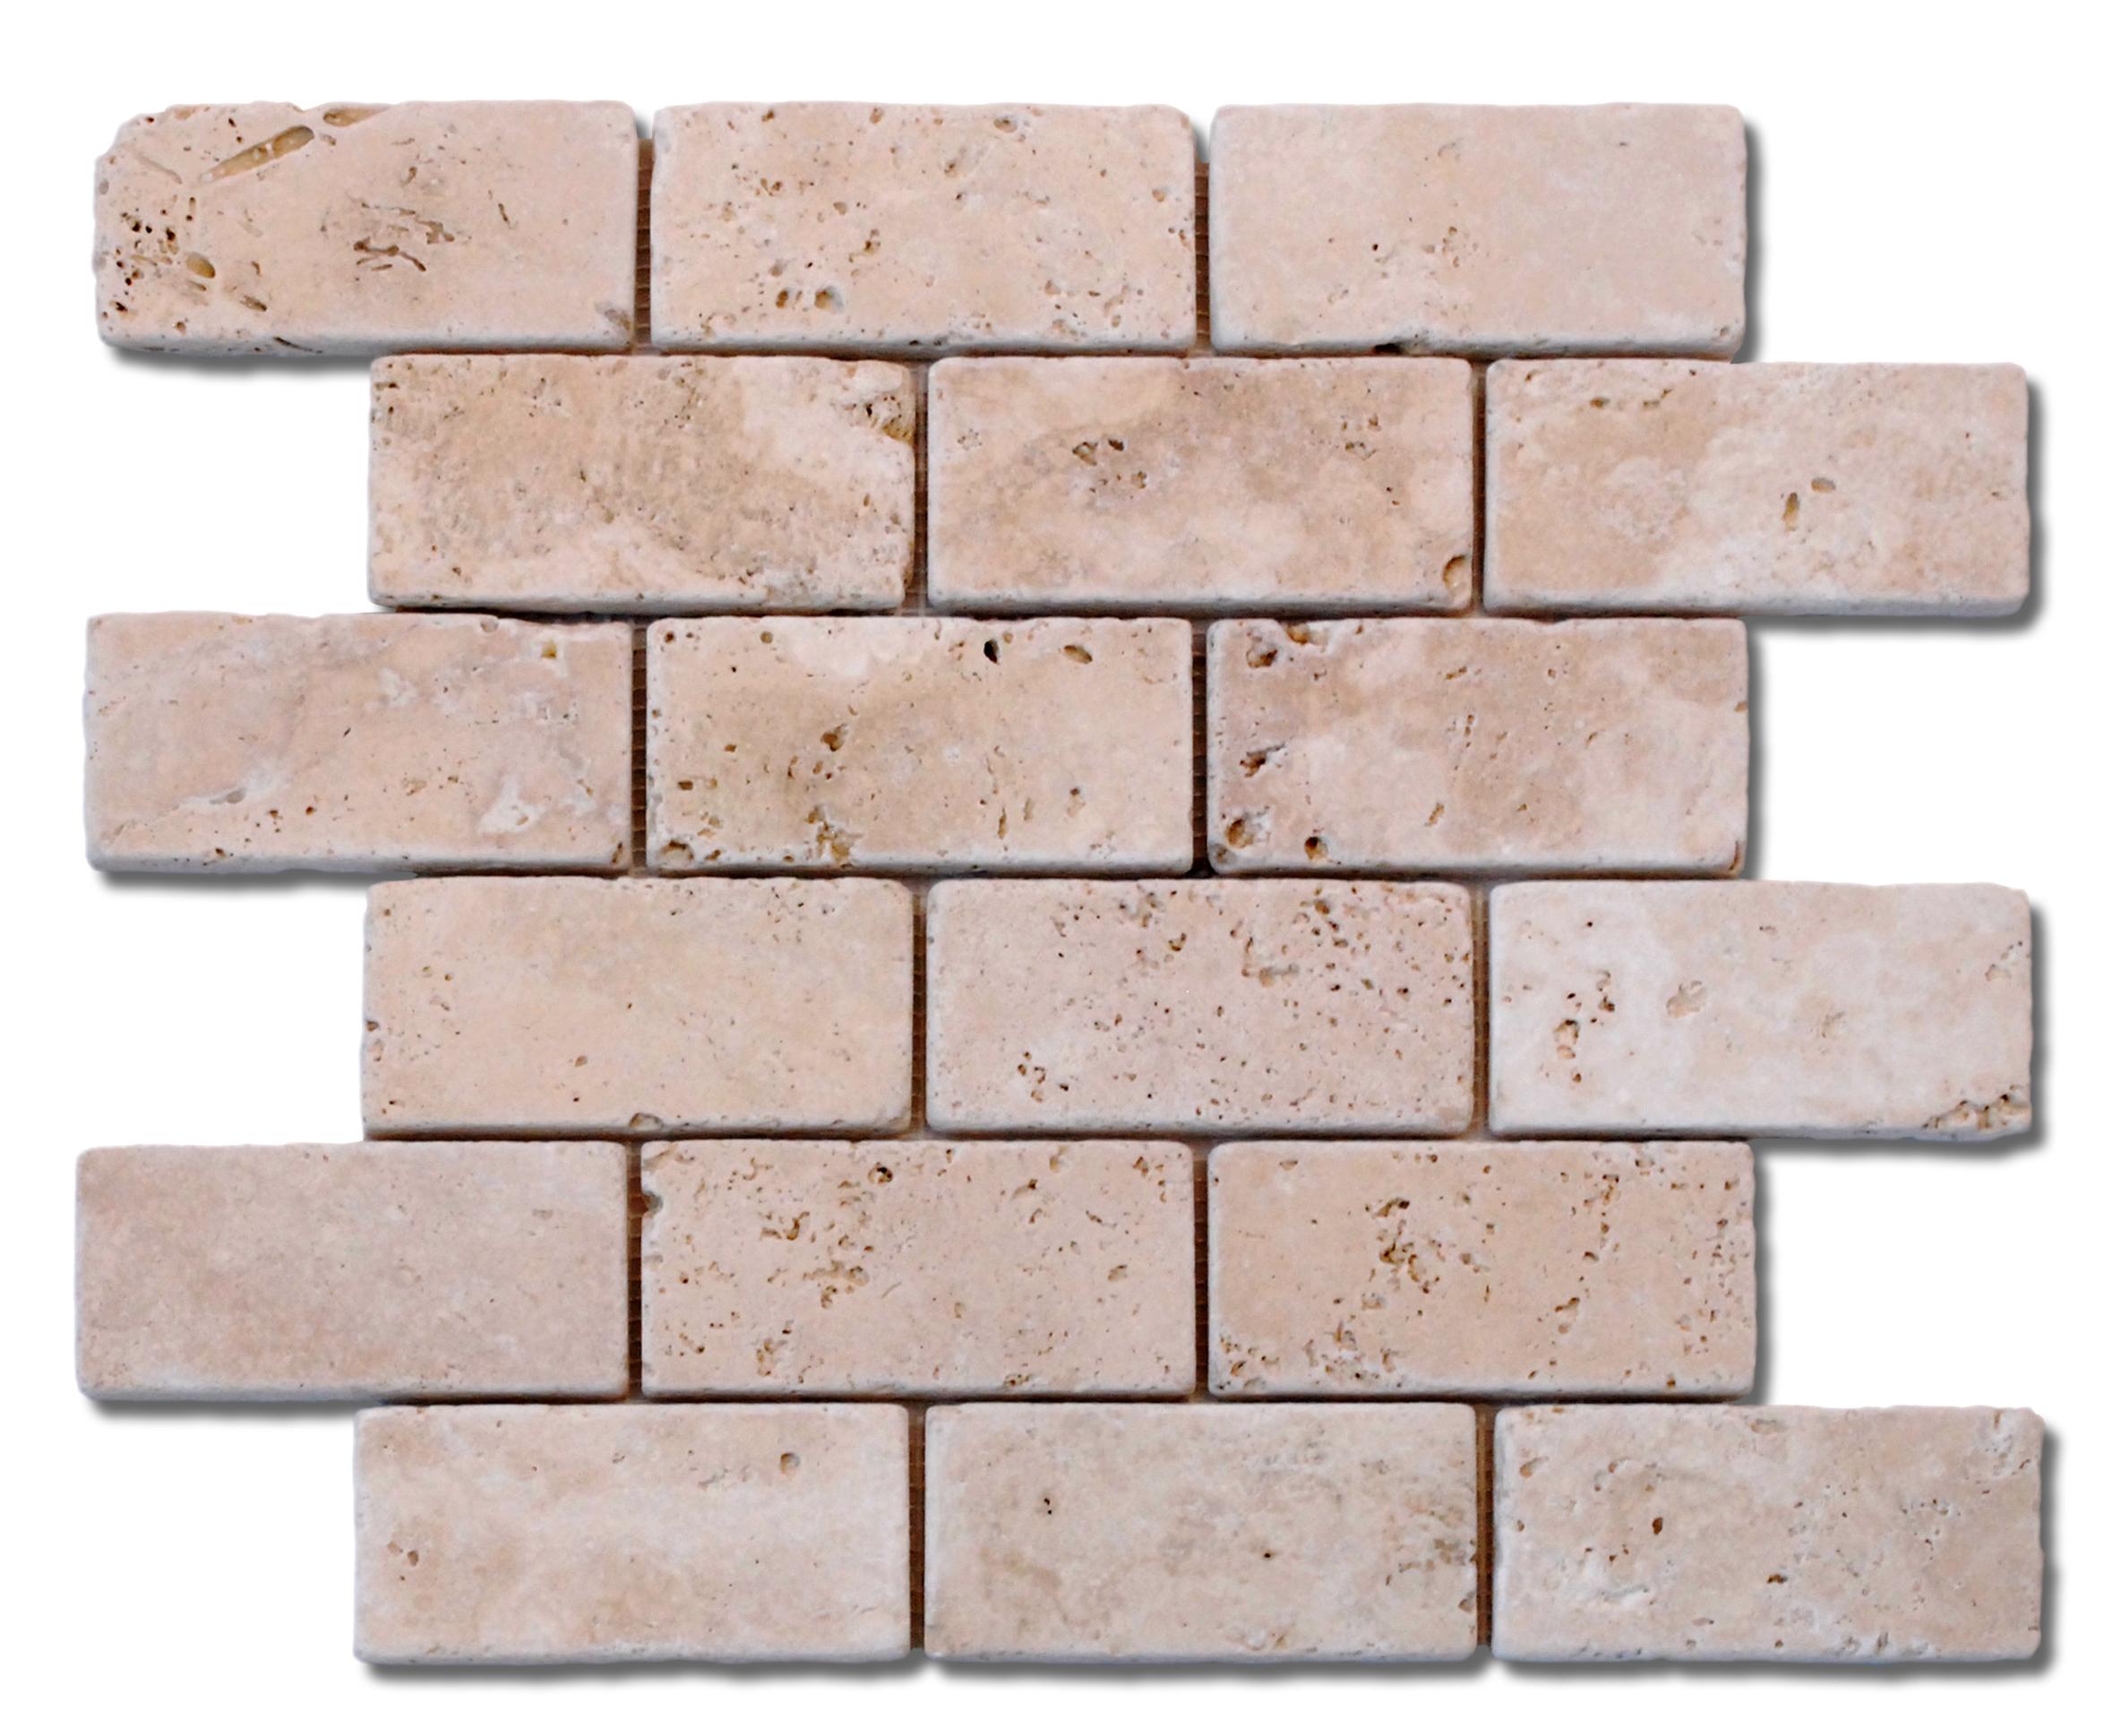 white travertine anatolia tile brick mosaic backsplash 2